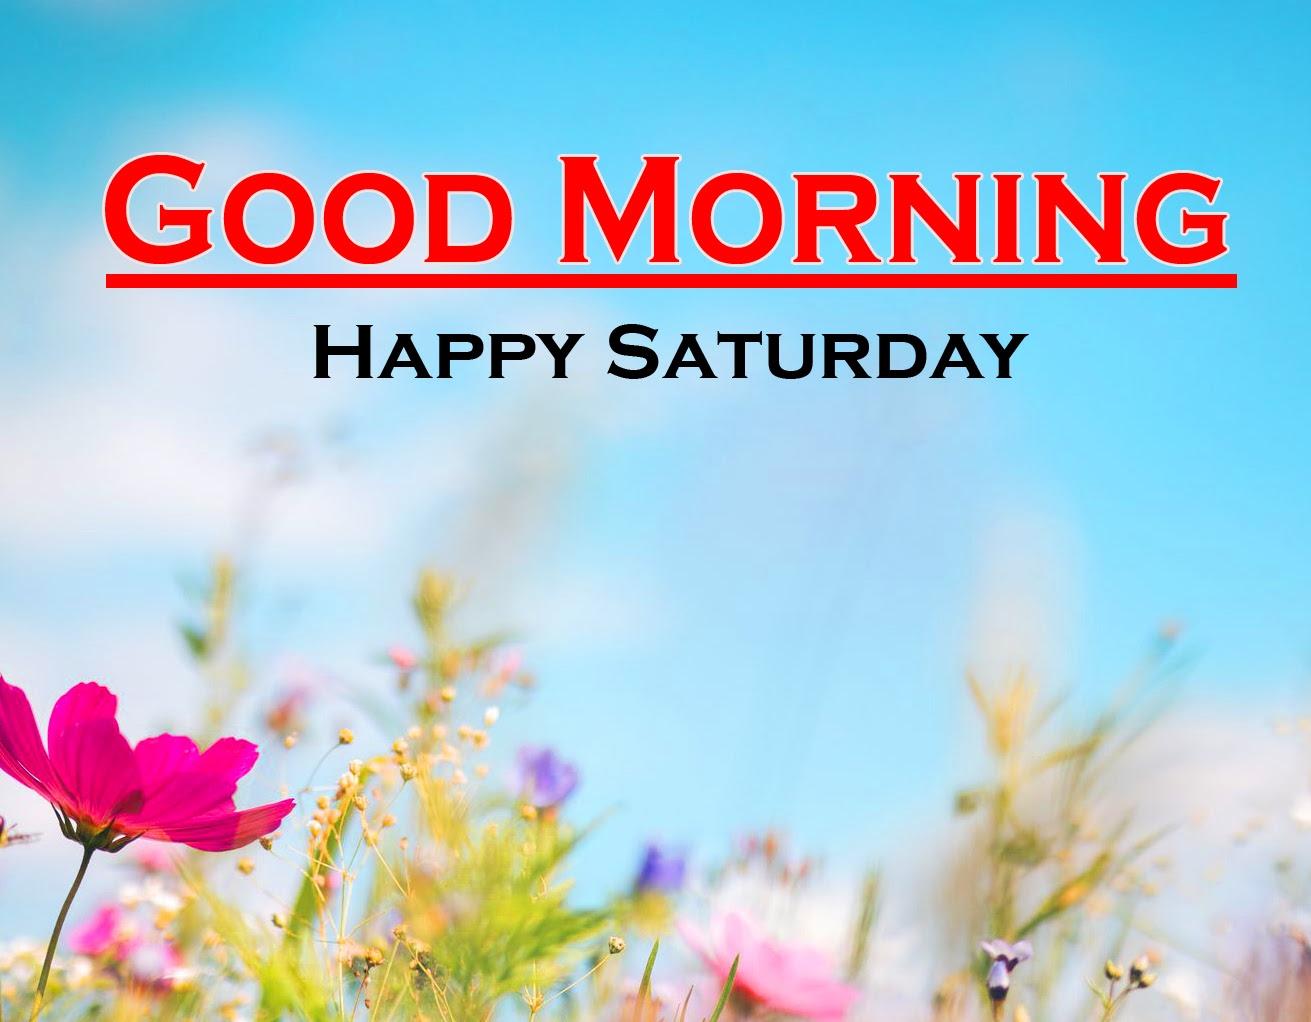 Saturday Good Morning Images 6